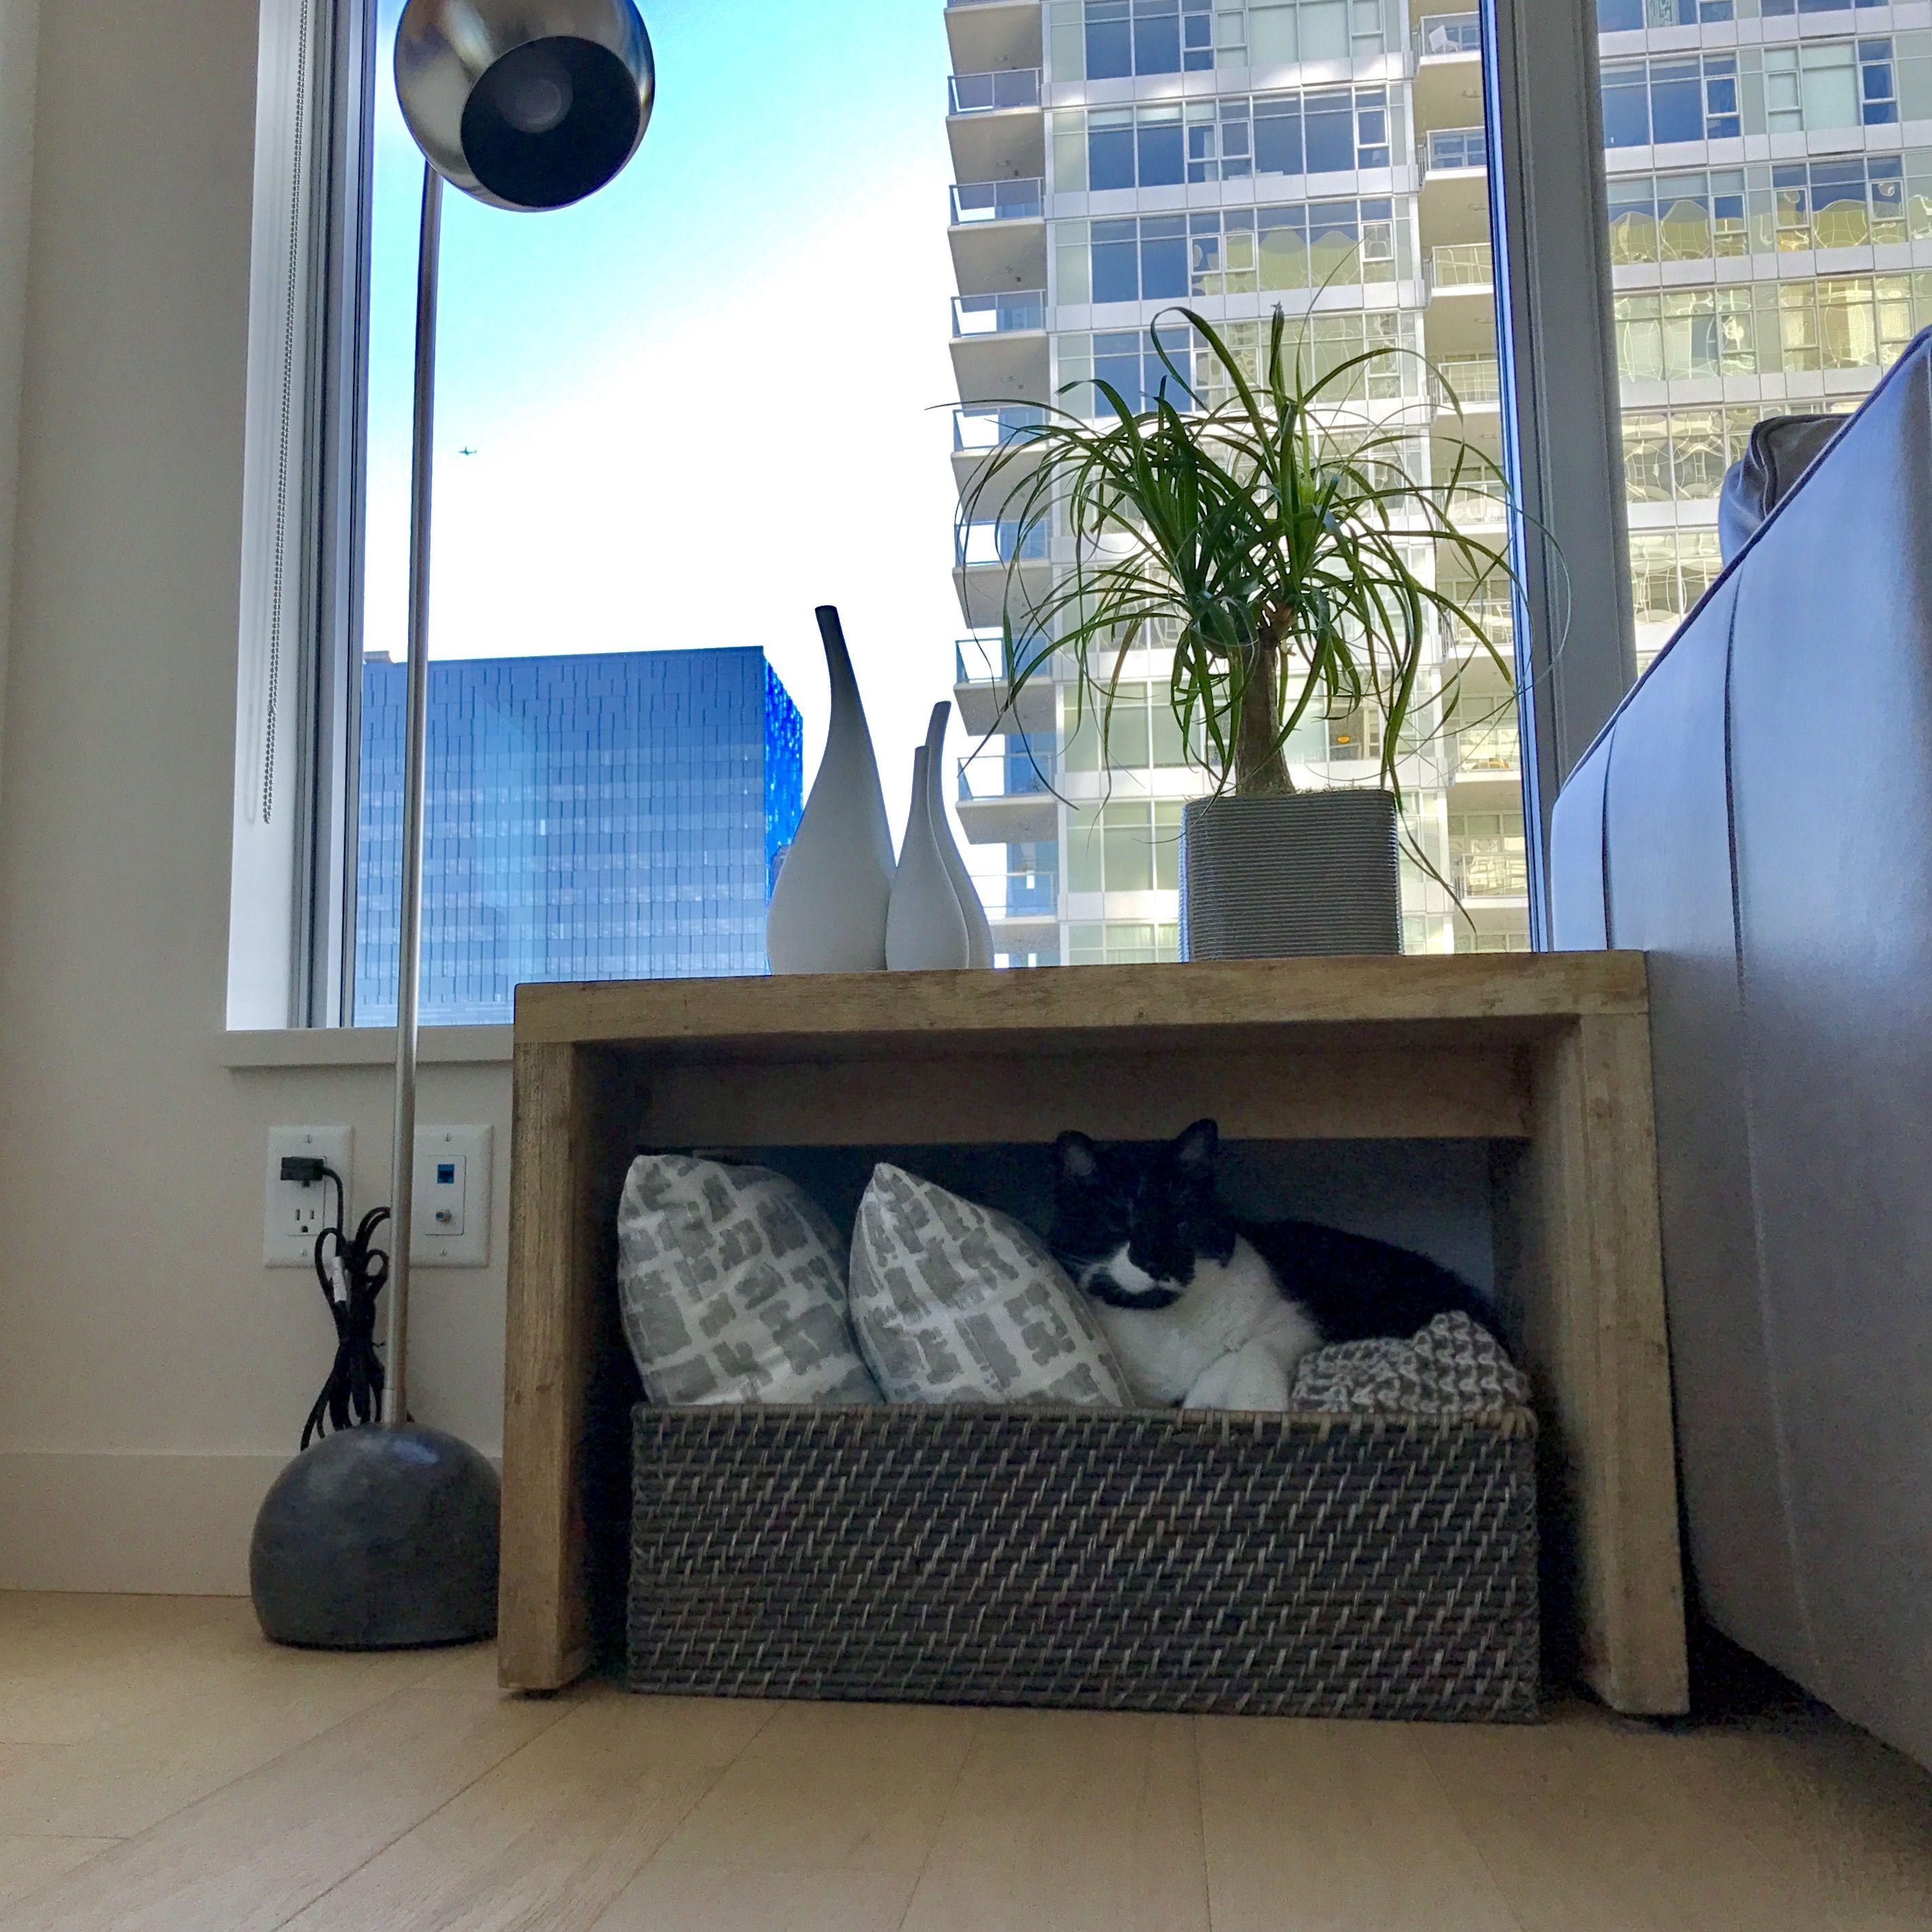 West elm organizer basket kittyus favorite comfy spot seattle